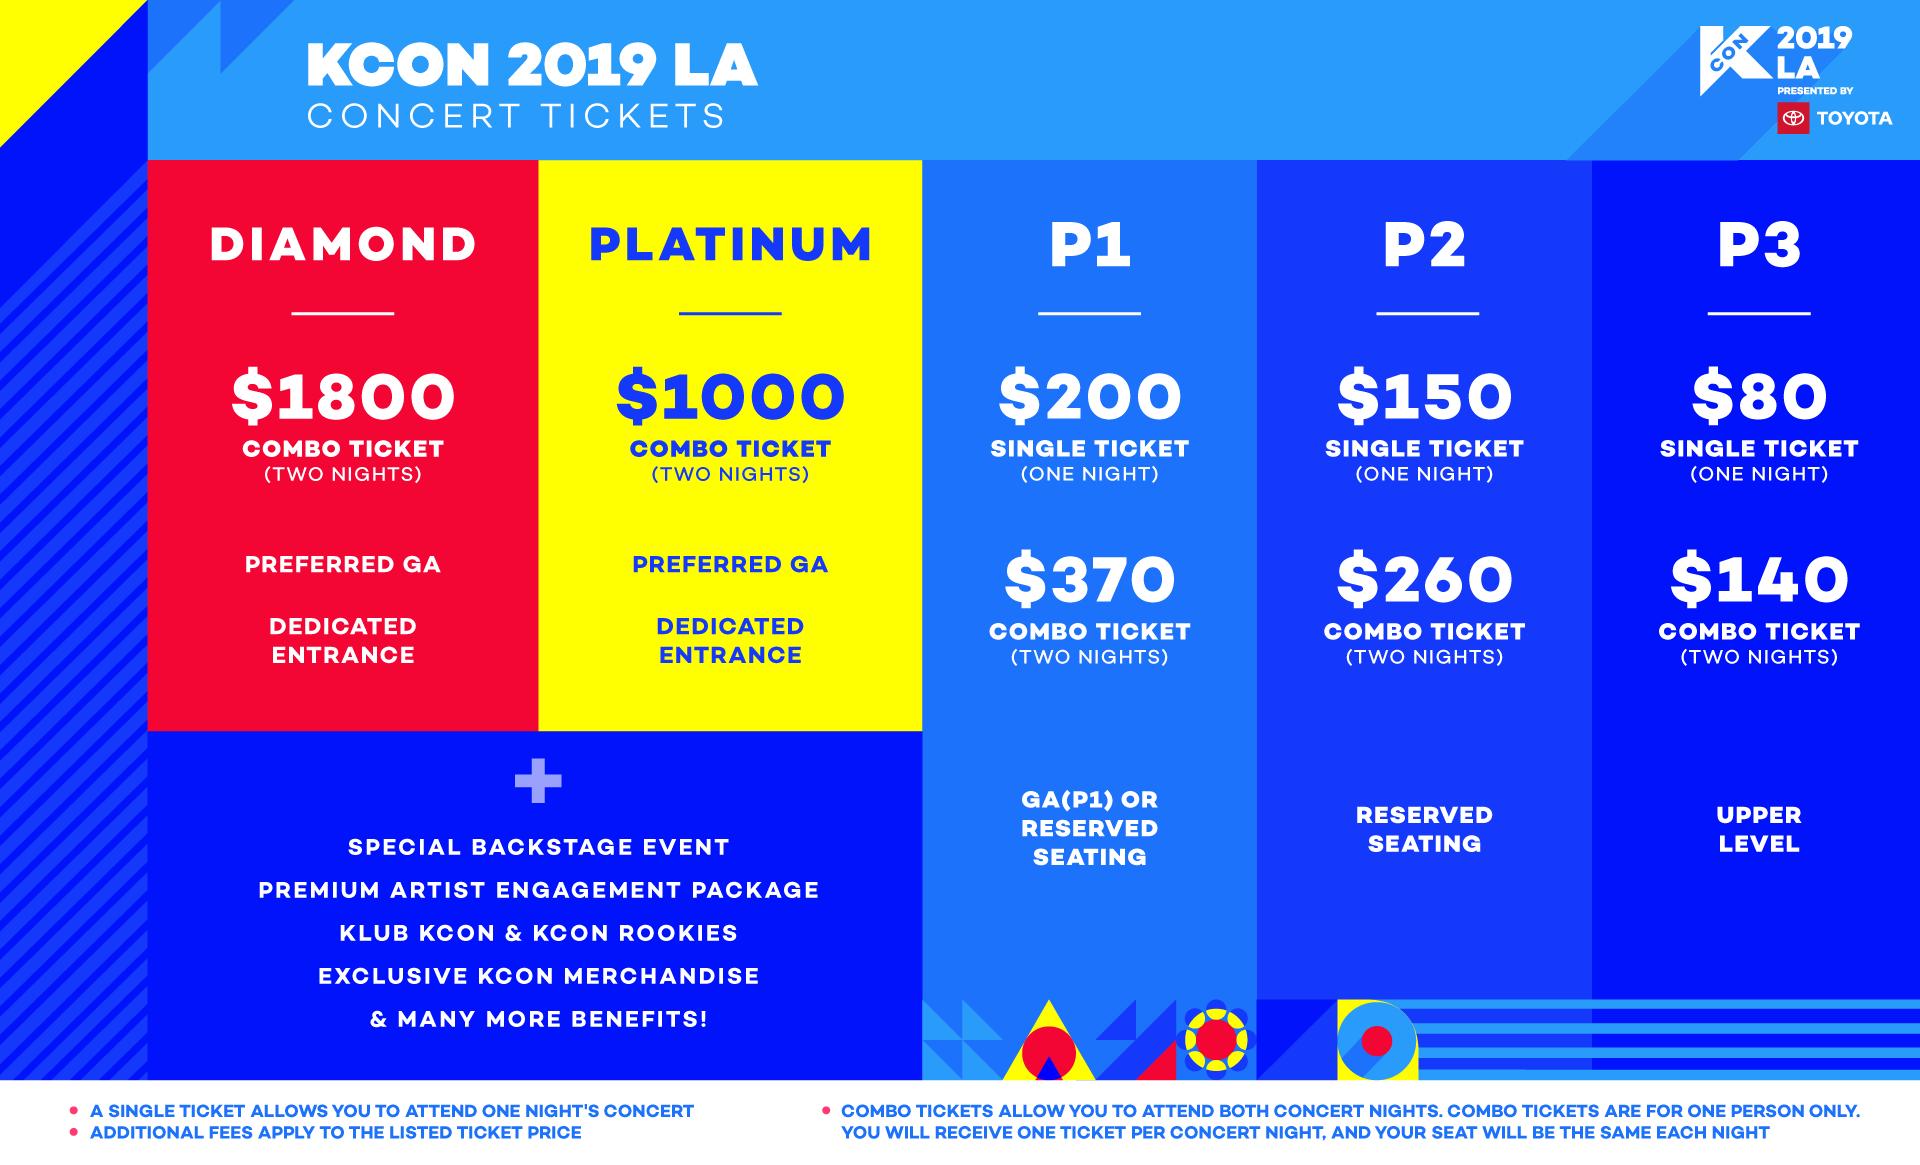 KCON LA - Concert Tickets - KCON USA OFFICIAL SITE